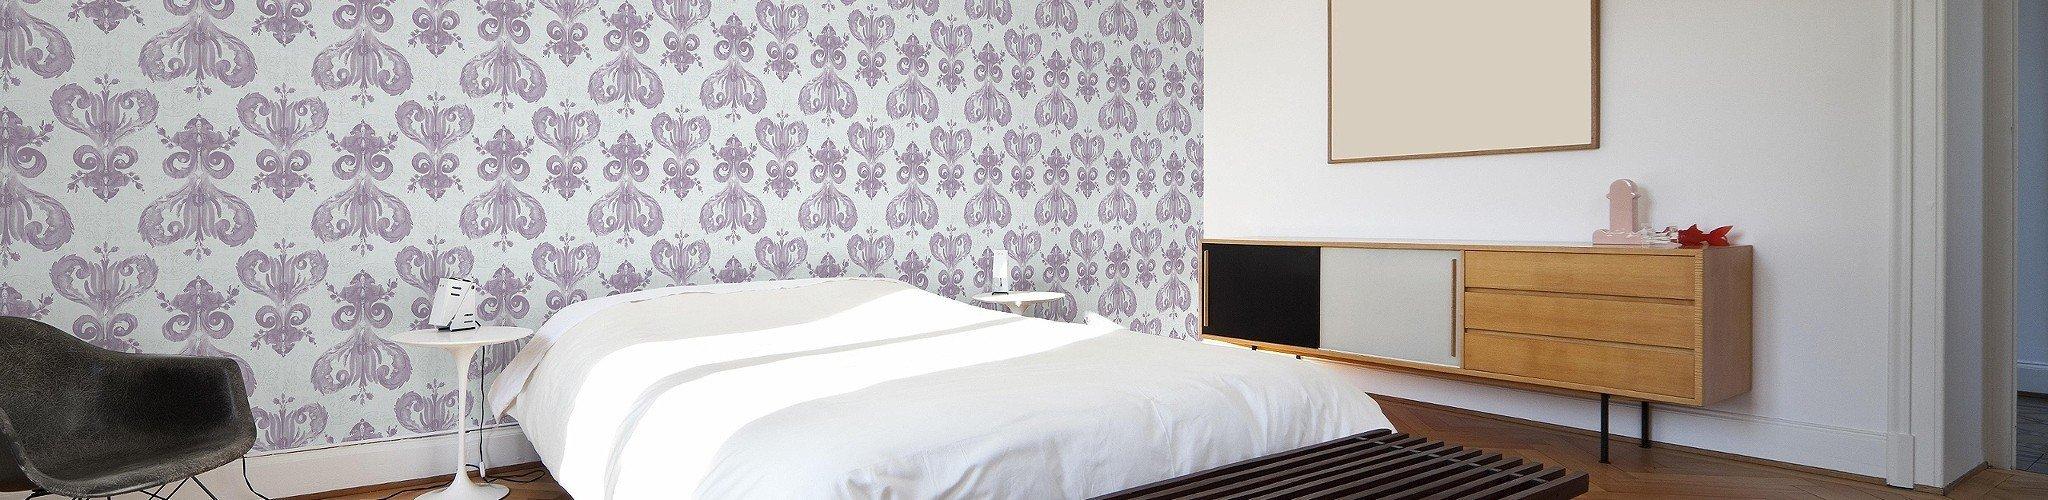 paisley lila tapeten lust auf was neues. Black Bedroom Furniture Sets. Home Design Ideas